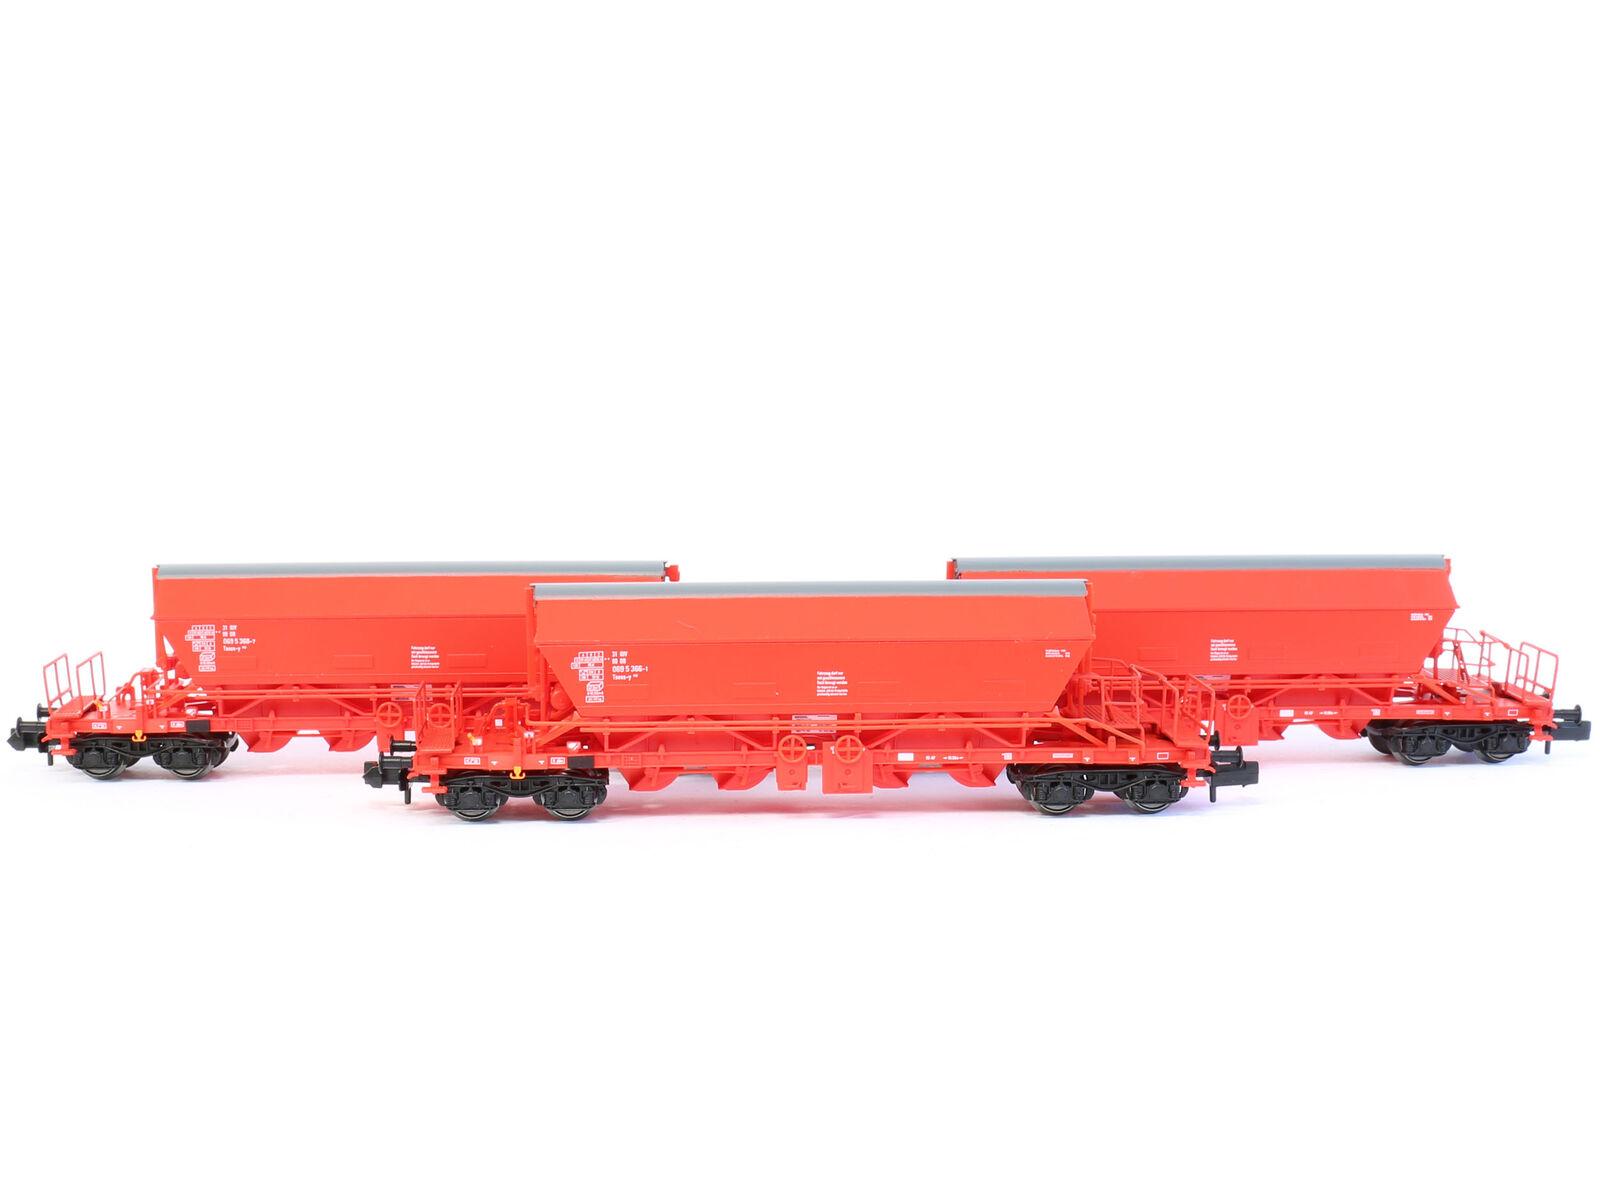 Kuehn 93032-vagones kaliwagen uaoos 9331 DB 3x-pista N-nuevo